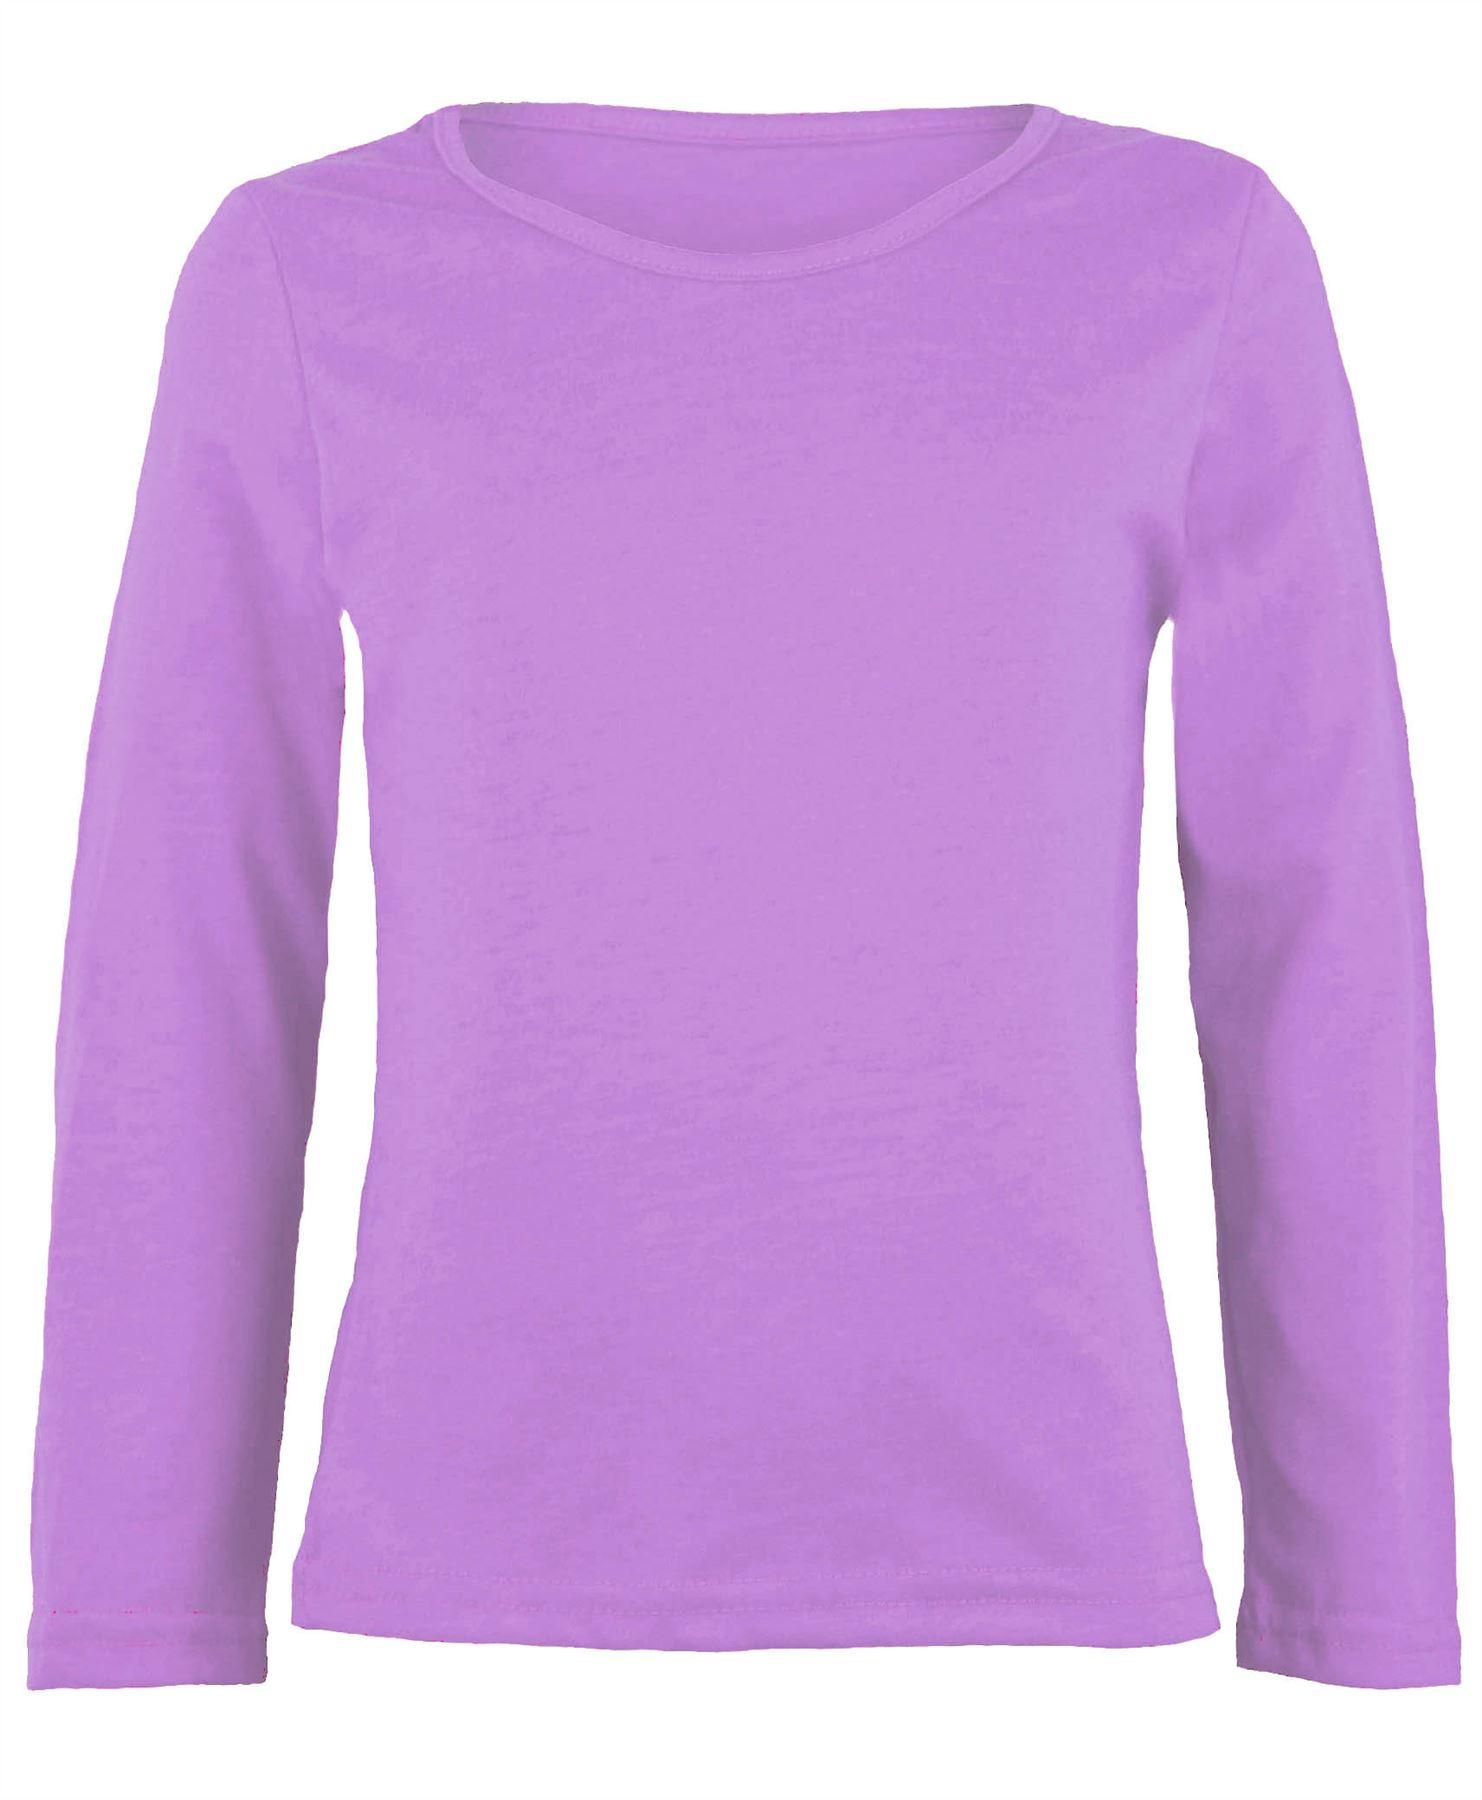 Kids cotton long sleeve plain basic top girls t shirt crew for Long sleeve cotton tee shirts